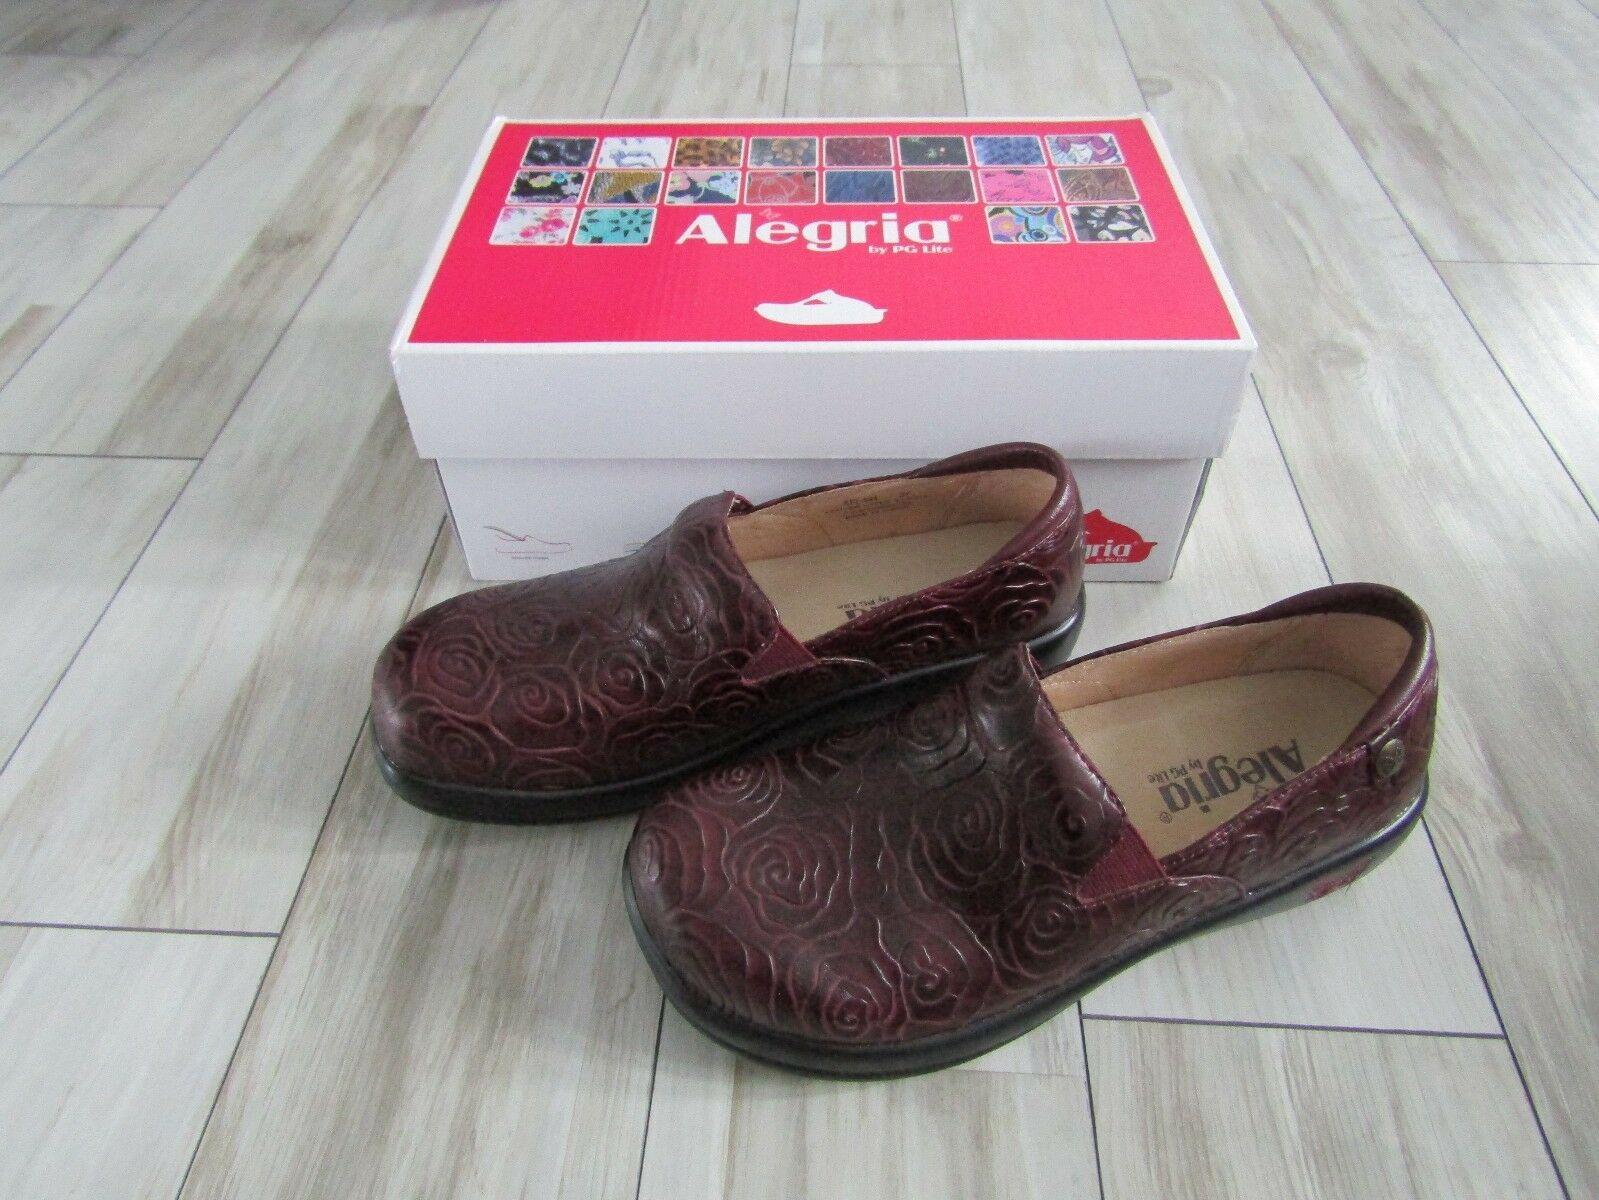 Alegria Keli Wine pinktte Nurse Doctor Chef shoes Clogs NIB